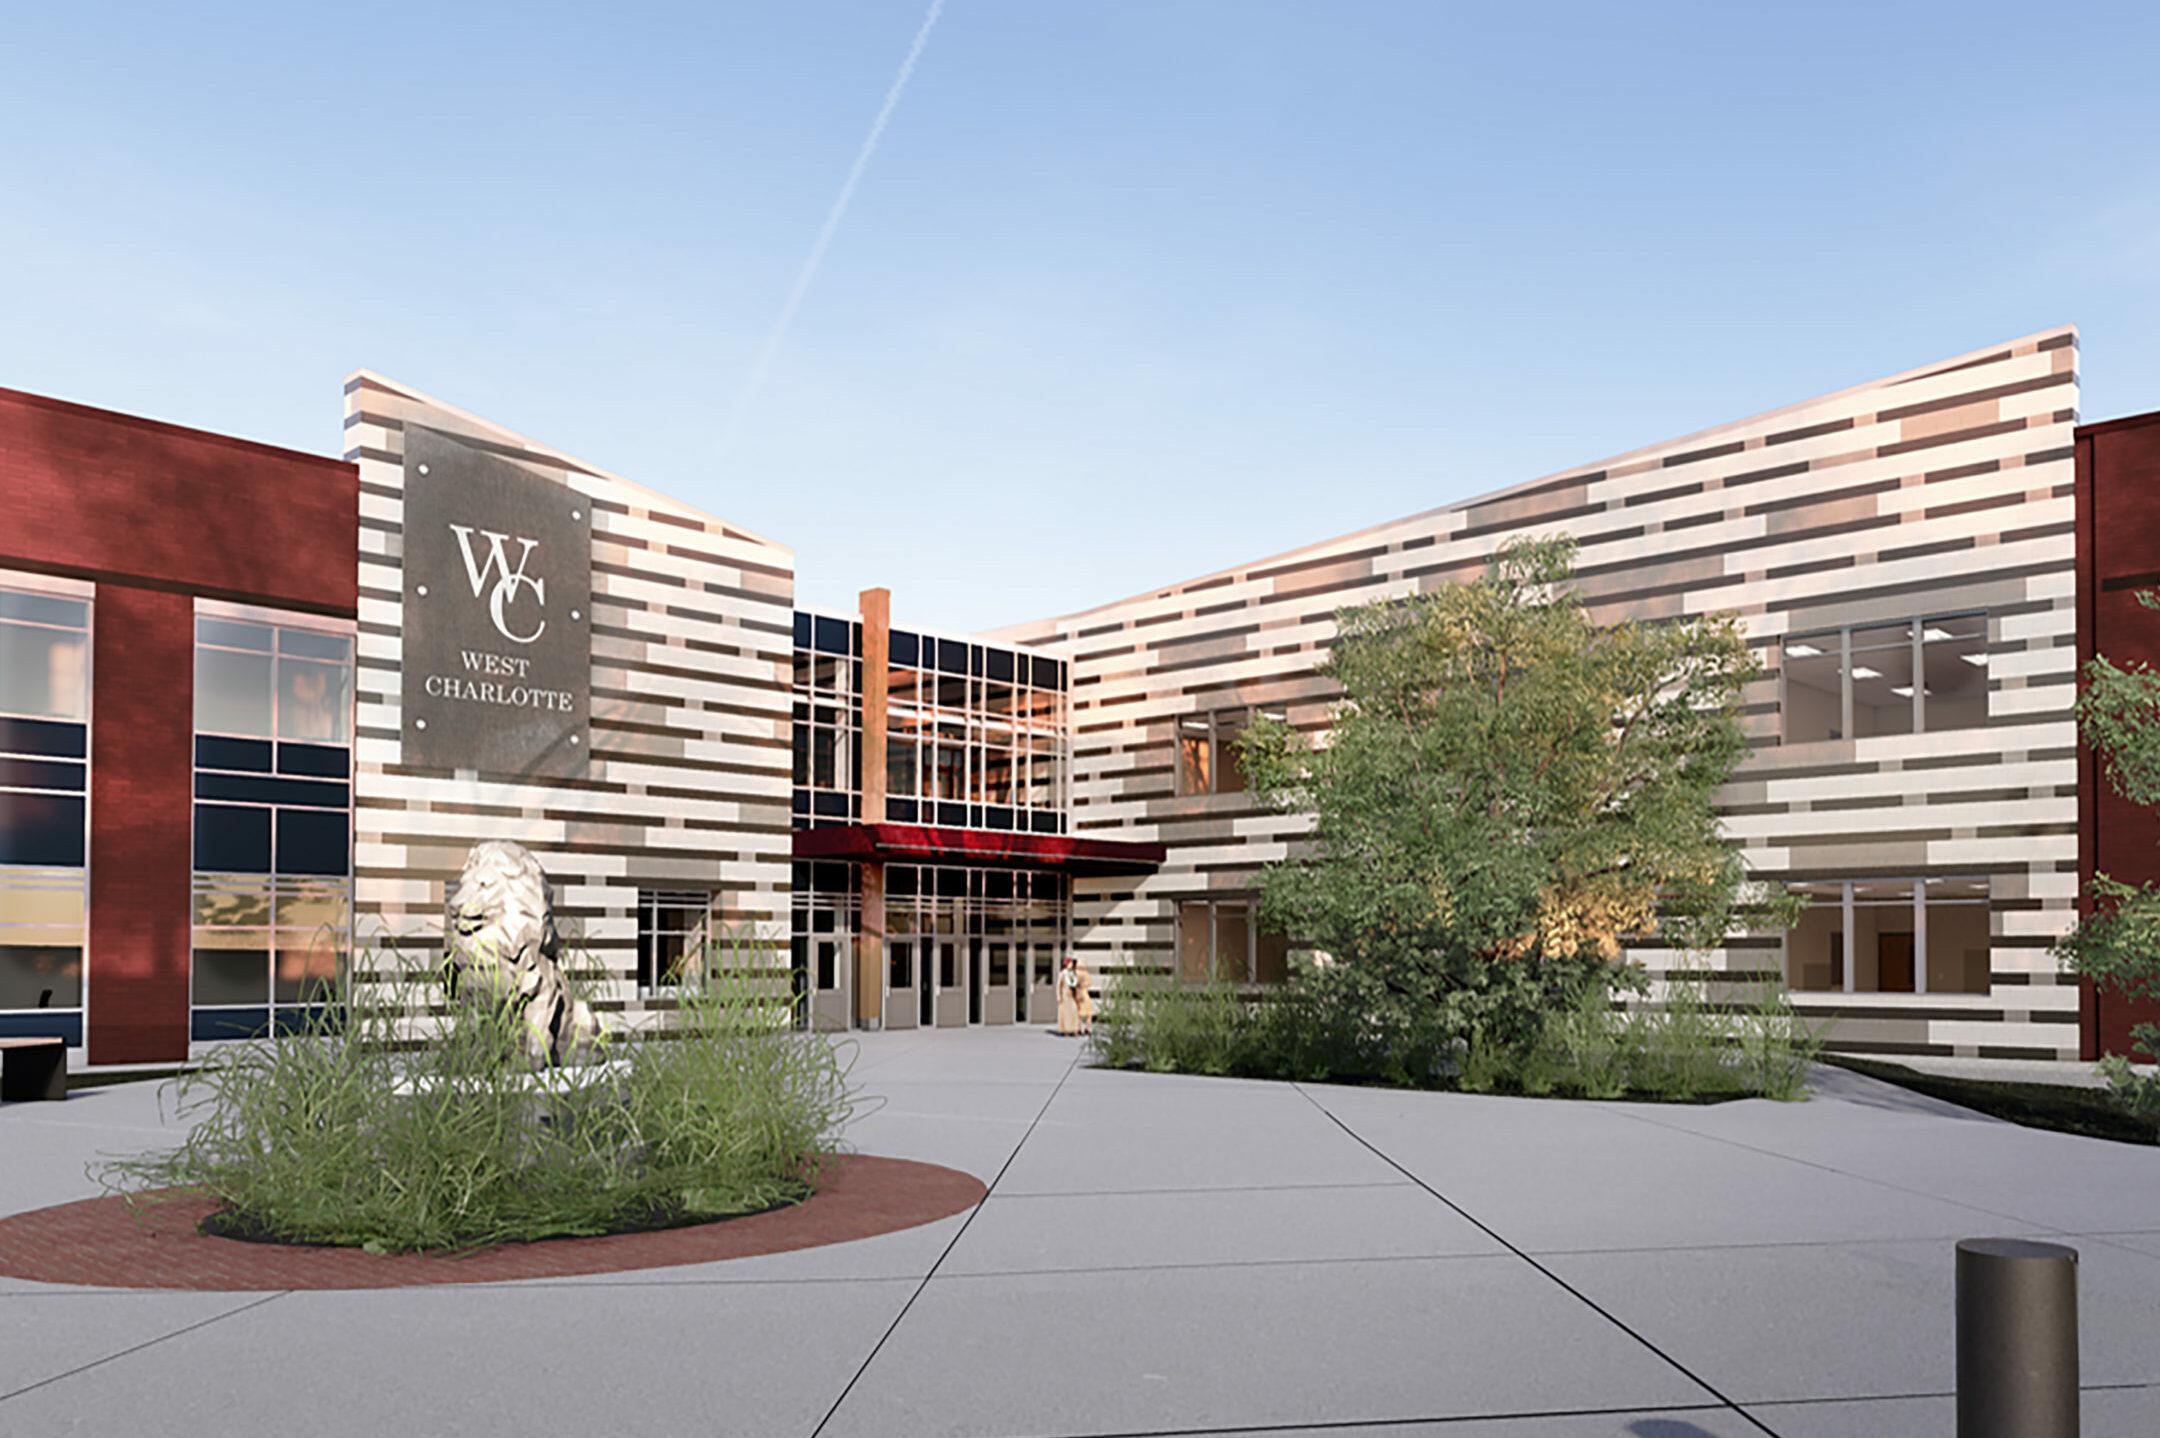 New West Charlotte High School